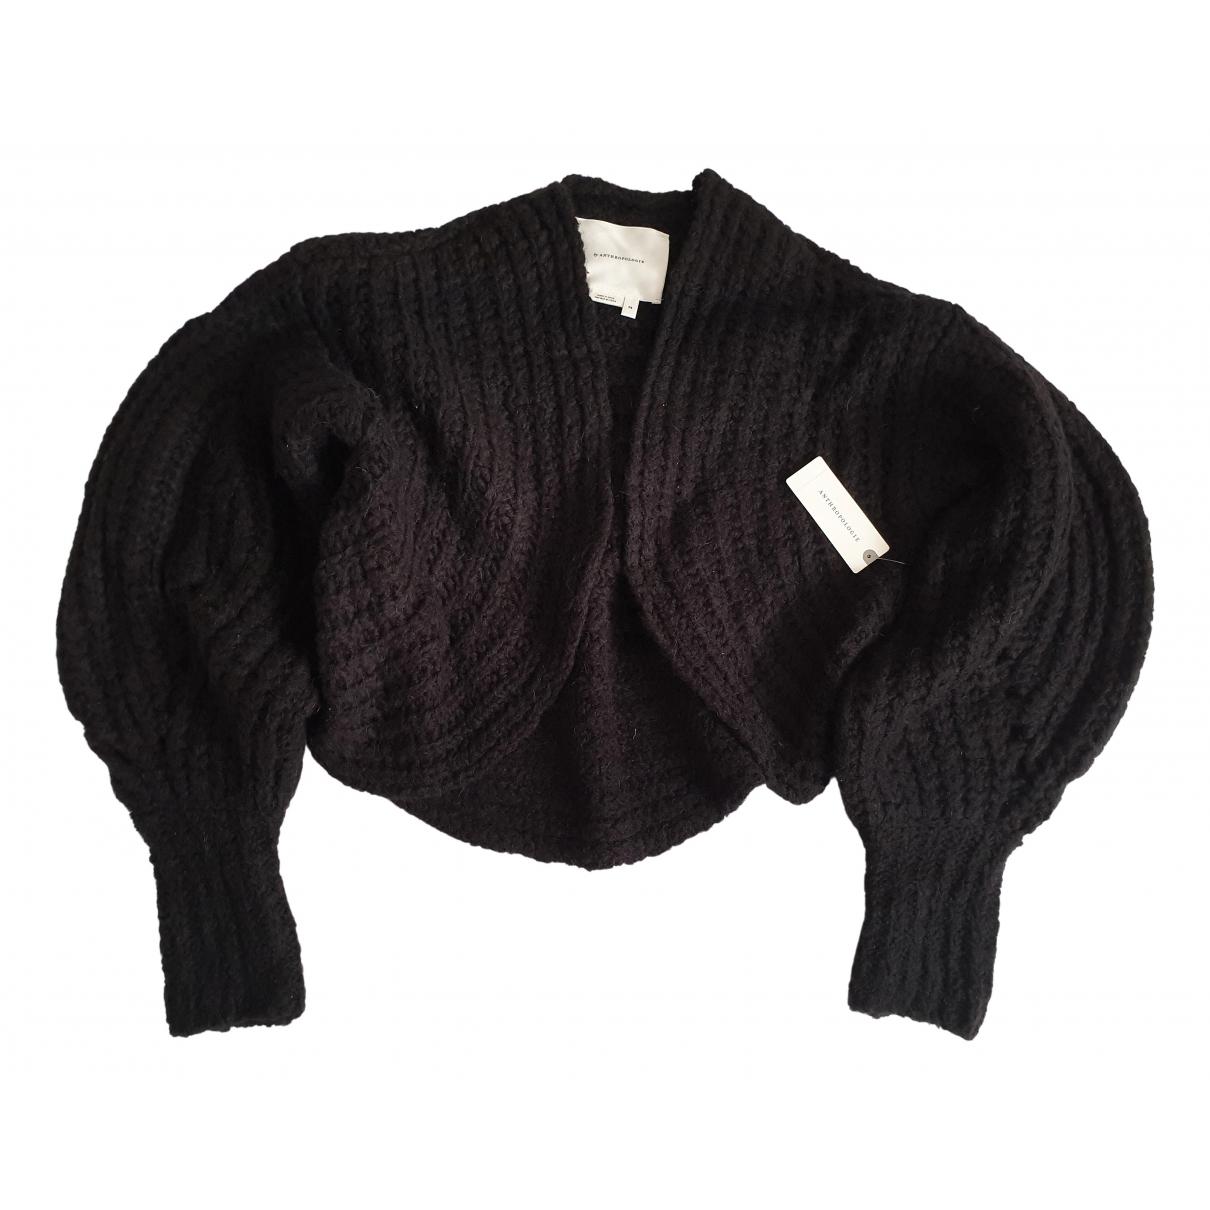 Anthropologie - Pull   pour femme en laine - noir